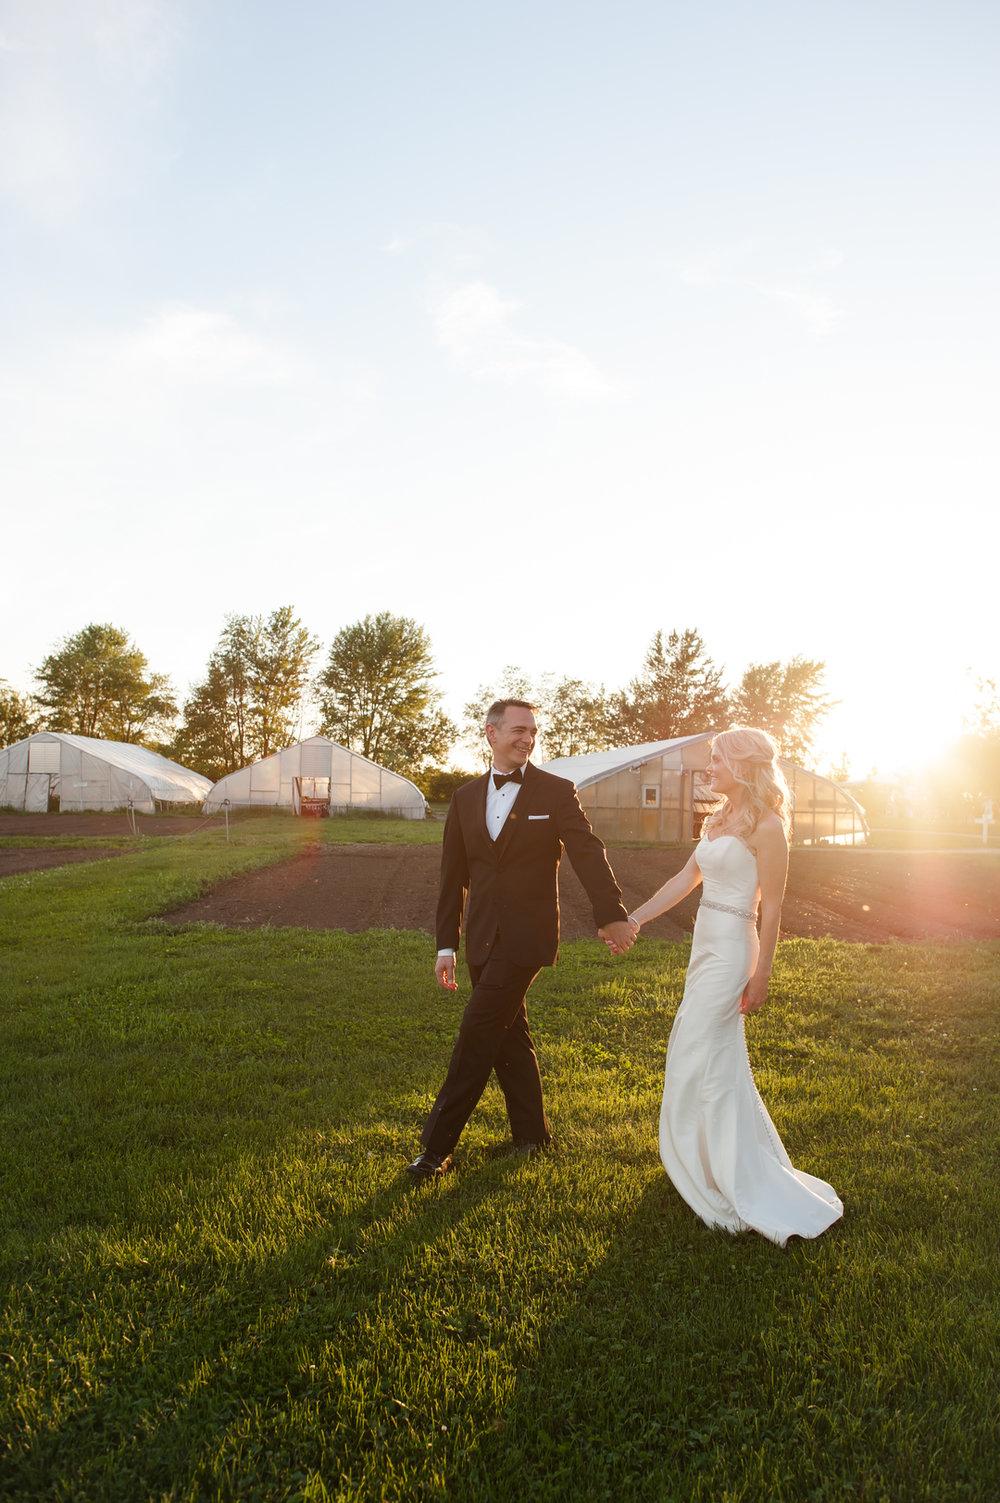 Sunset Bride and Groom Portrait Chicago Farm Wedding Elite Photo